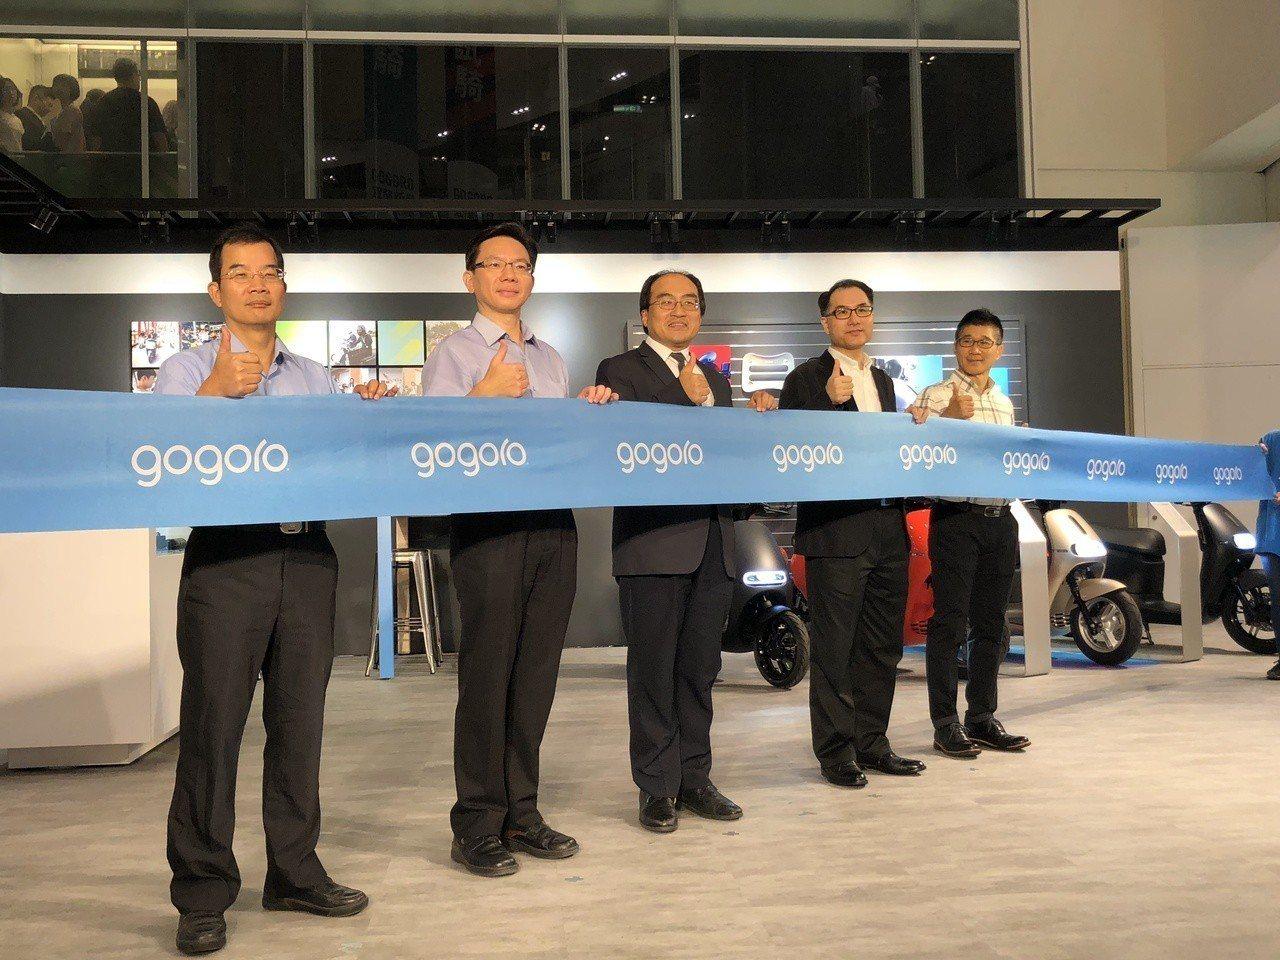 Gogoro首座宜蘭門市今天正式開幕,這也是東半部第一個換電站,工業局長呂正華(...